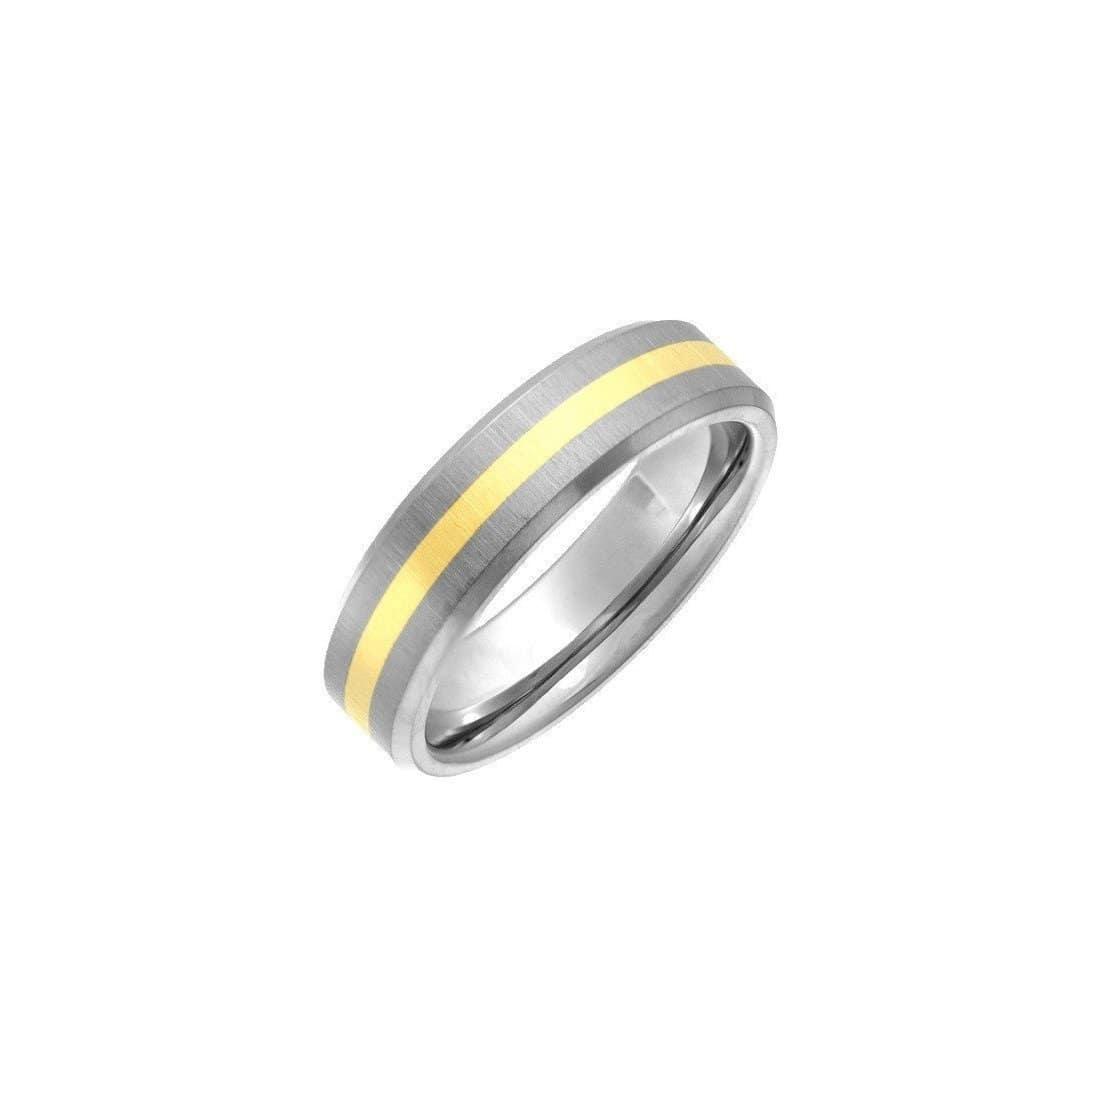 Titanium & 9kt Yellow Gold Inlay 6mm Flat Court-Shape Wedding Ring